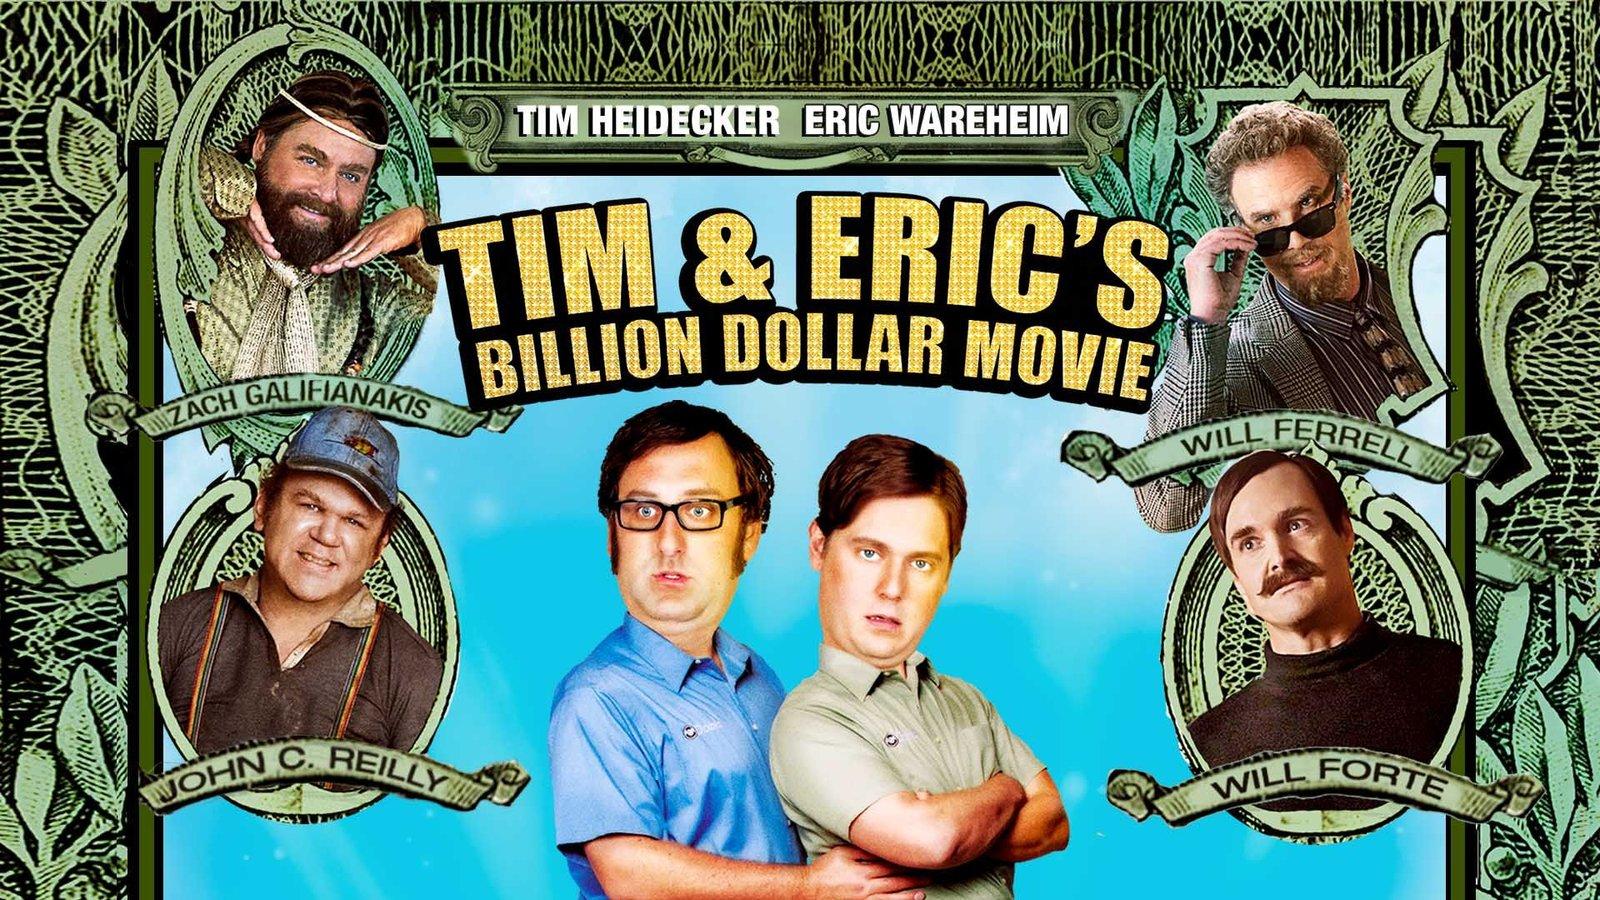 Tim & Eric's Billion Dollar Movie